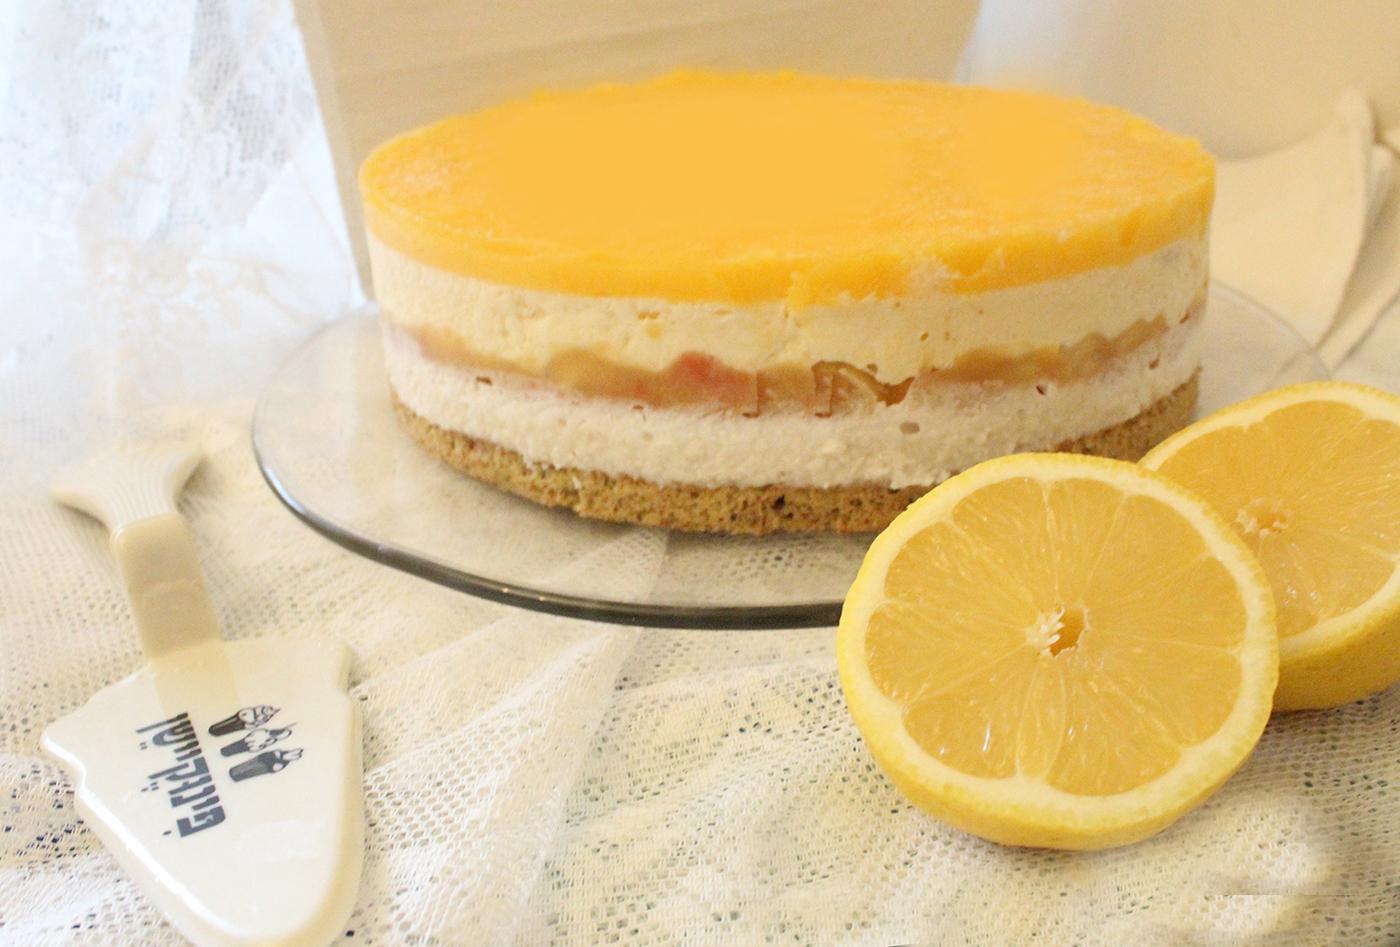 IMG 7764 - עוגה  אקזוטיתמרעננת